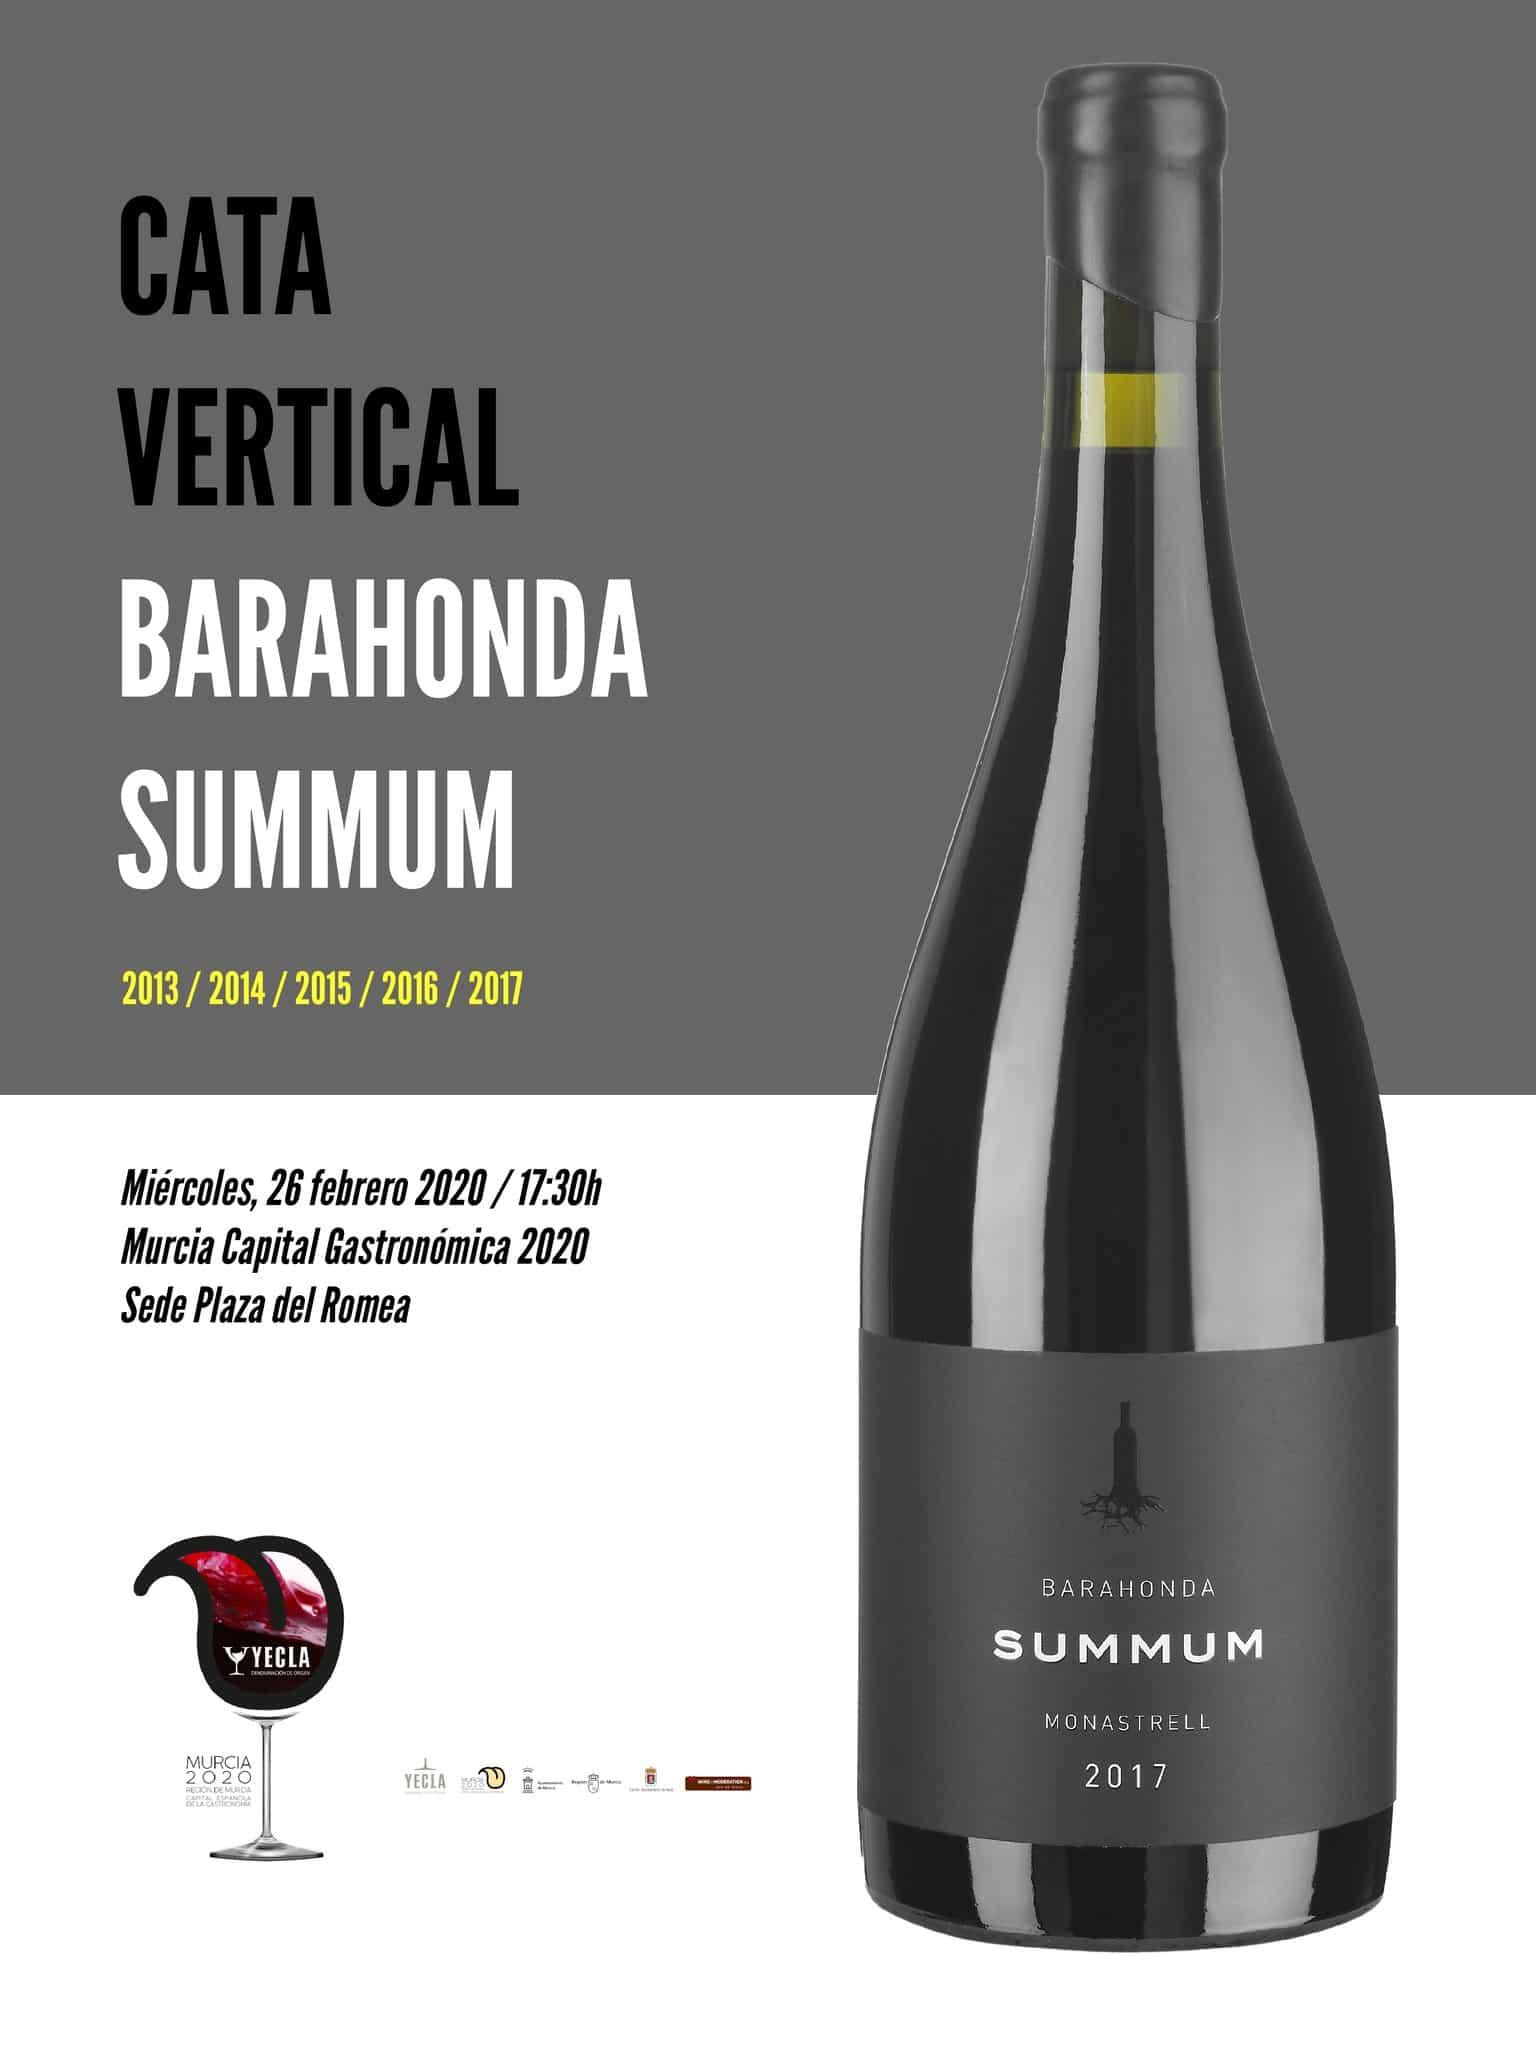 Cata vertical de Barahonda en Murcia Capital Gastronómica 2020